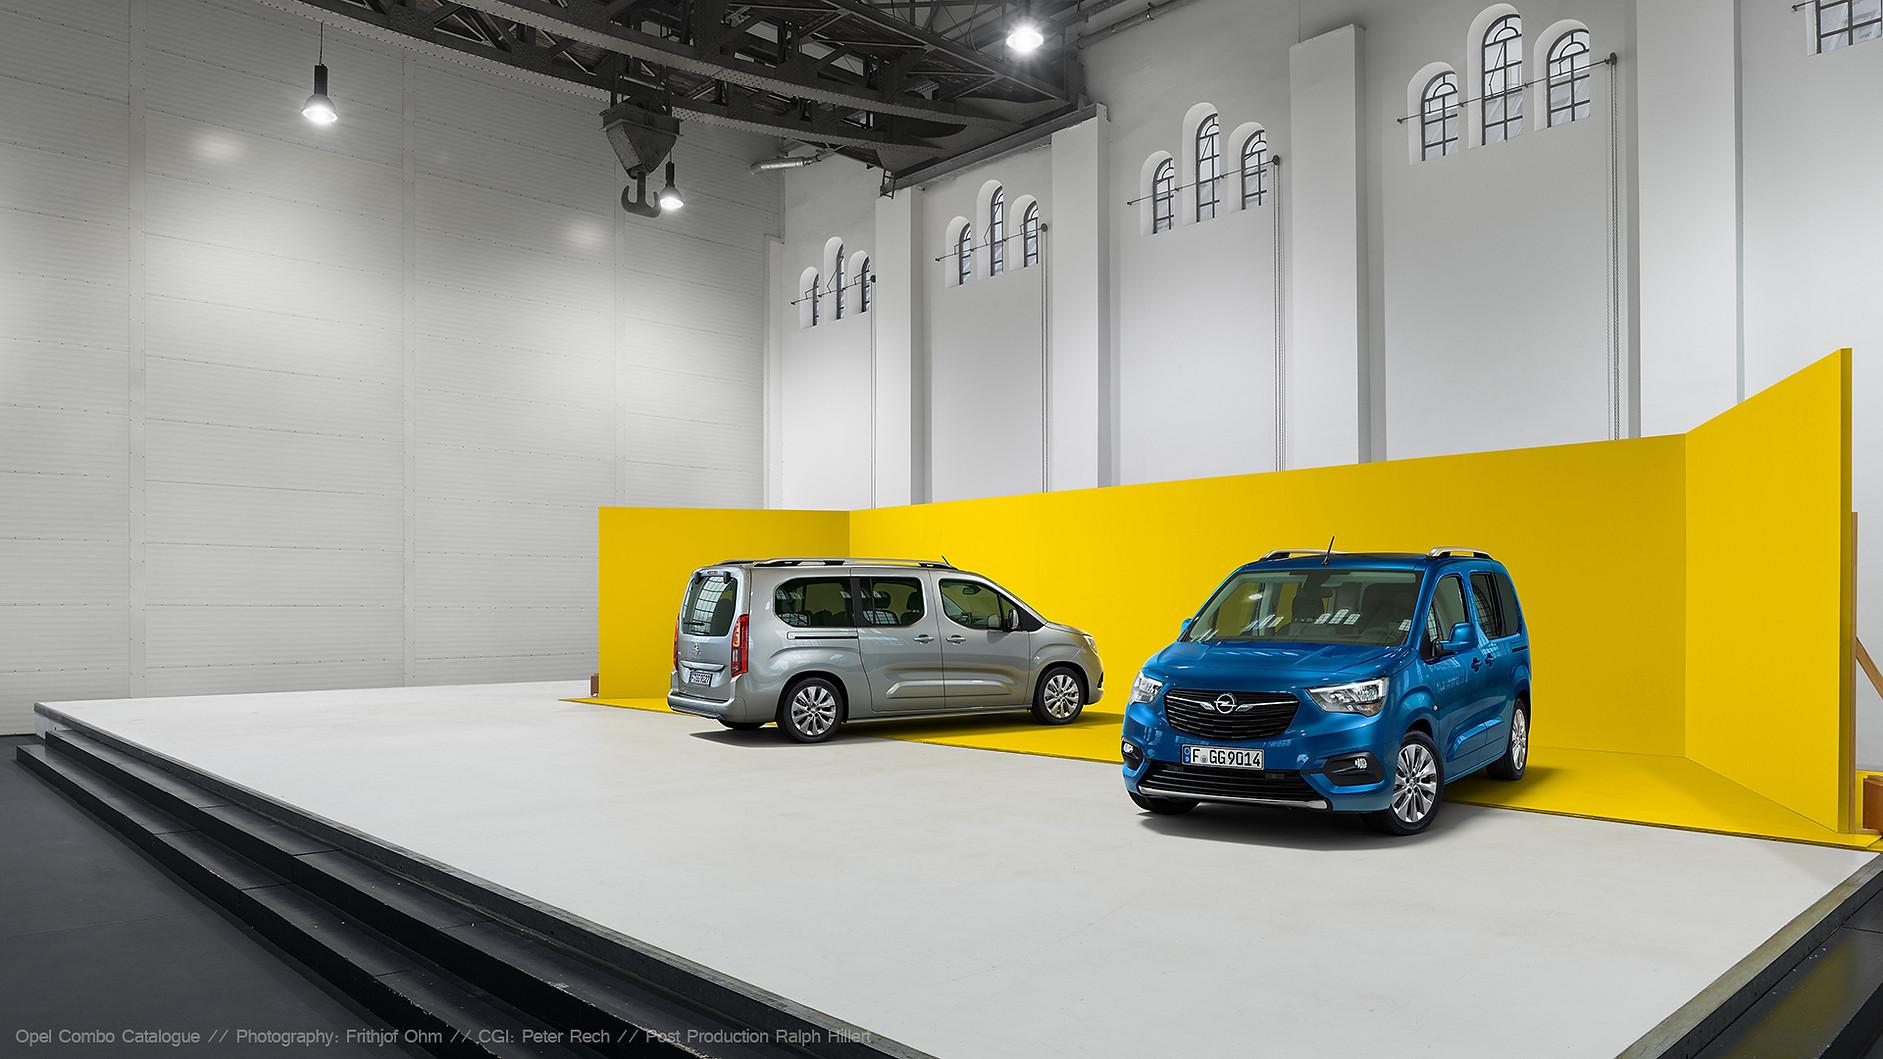 Opel_Combo_Katalog_03.jpg